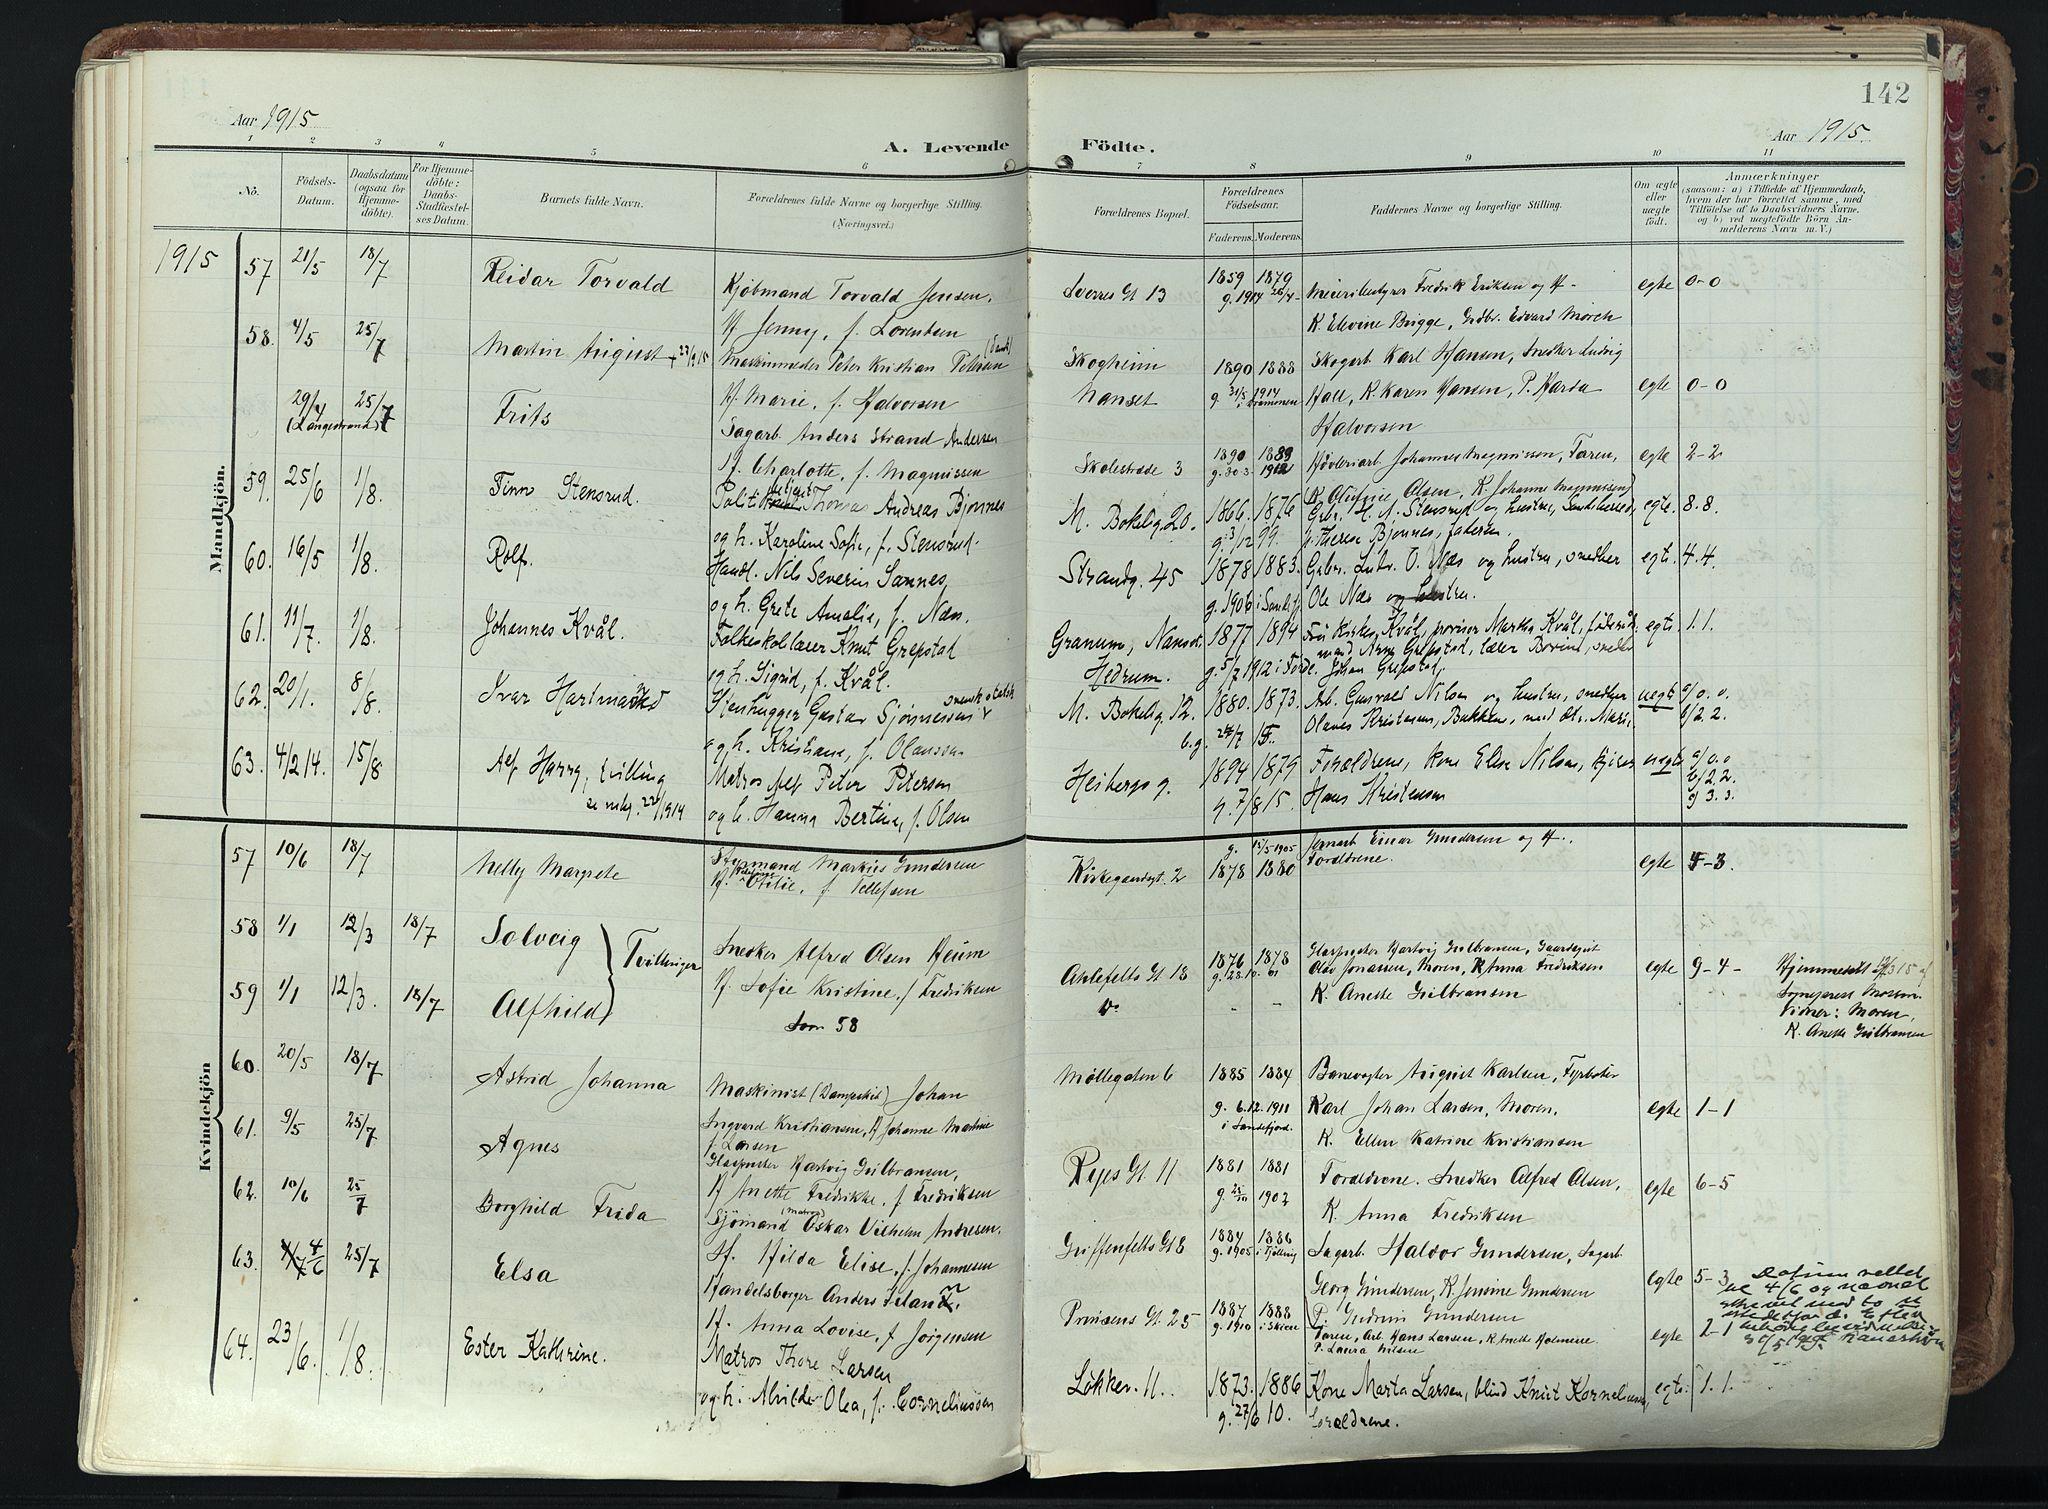 SAKO, Larvik kirkebøker, F/Fa/L0012: Ministerialbok nr. I 12, 1905-1933, s. 142